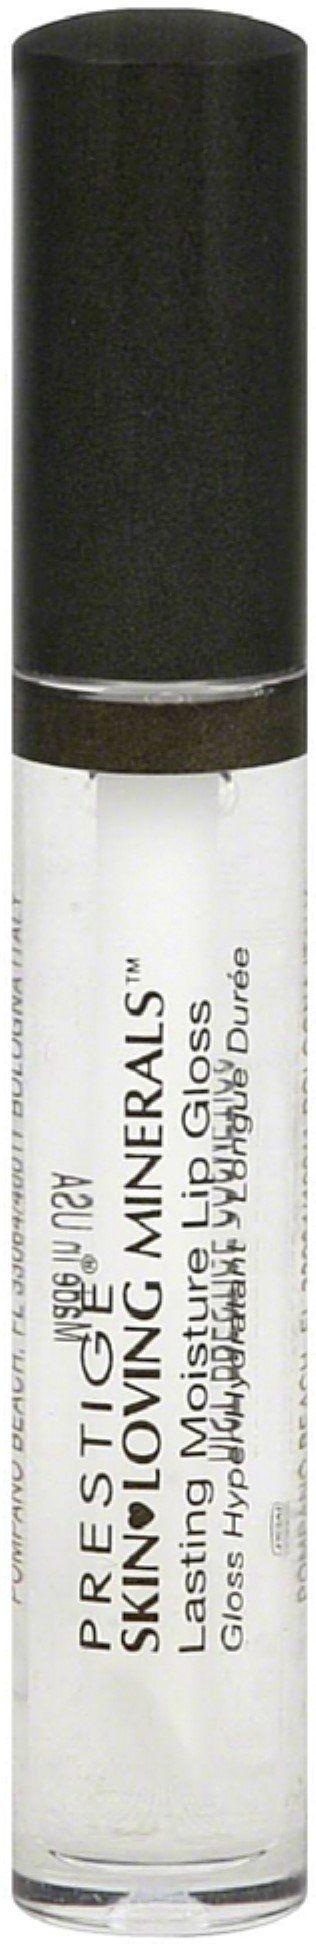 Prestige Skin Loving Minerals Lasting Moisture Lip Gloss, Crystal Clear 0.09 oz (Pack of 3). Product of Prestige. Pack of 3.